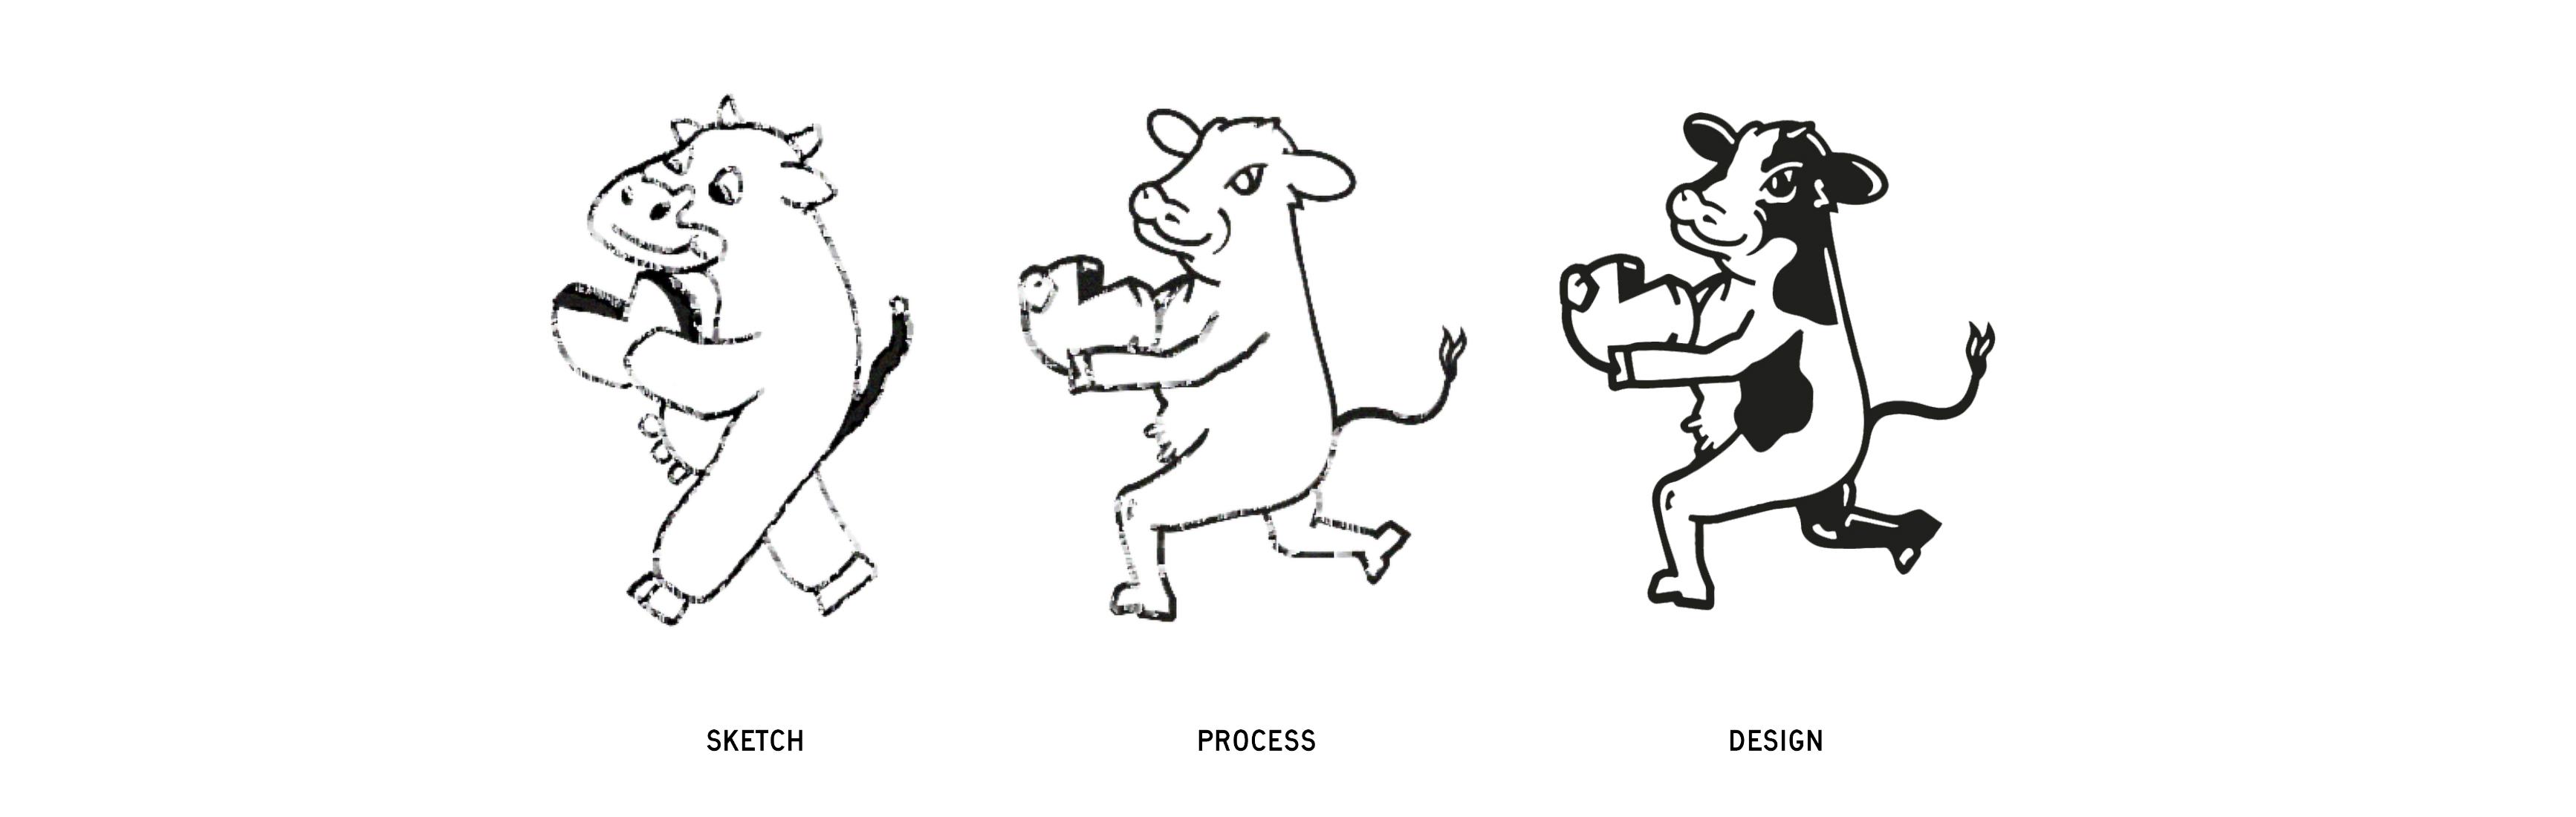 sketch-mascot-guideline-new-bridge-cheese-design-exploration-zeki-michael-design-cheese-cow-spread-tub-sku-range-agency-branding copy copy